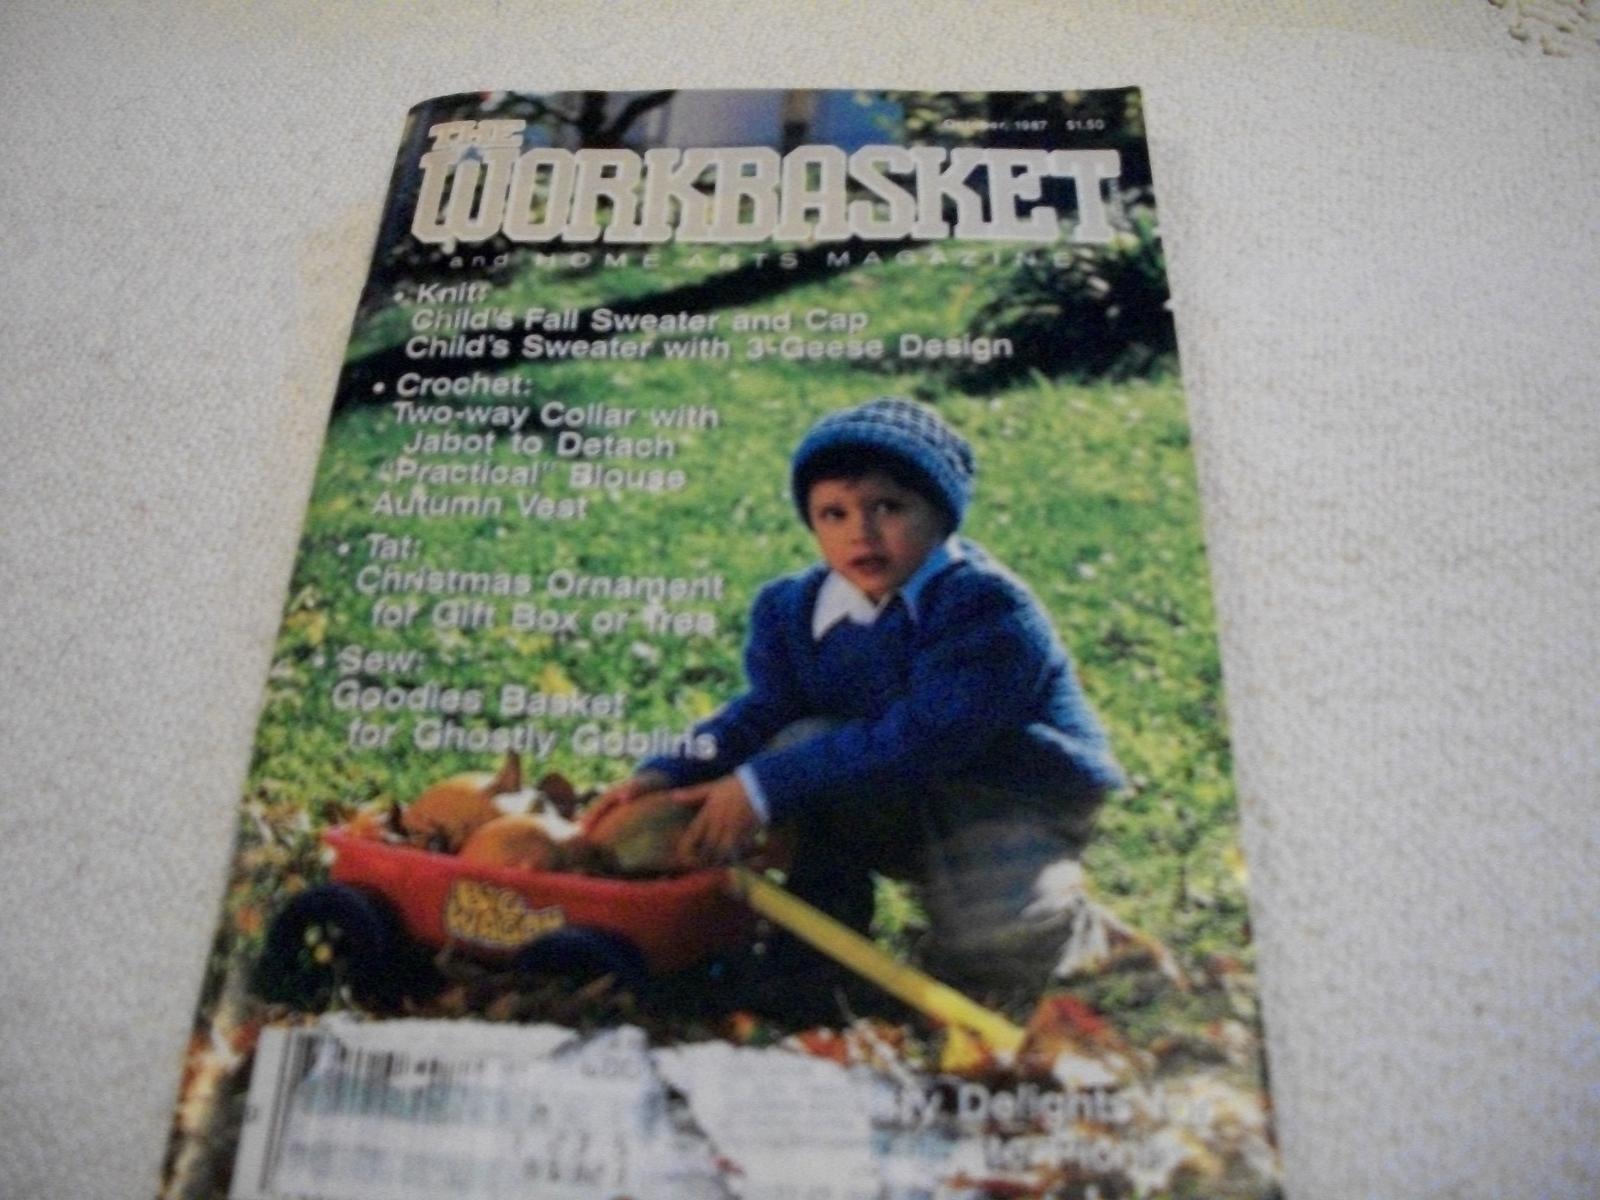 Workbasket Magazine October 1987 - $3.00